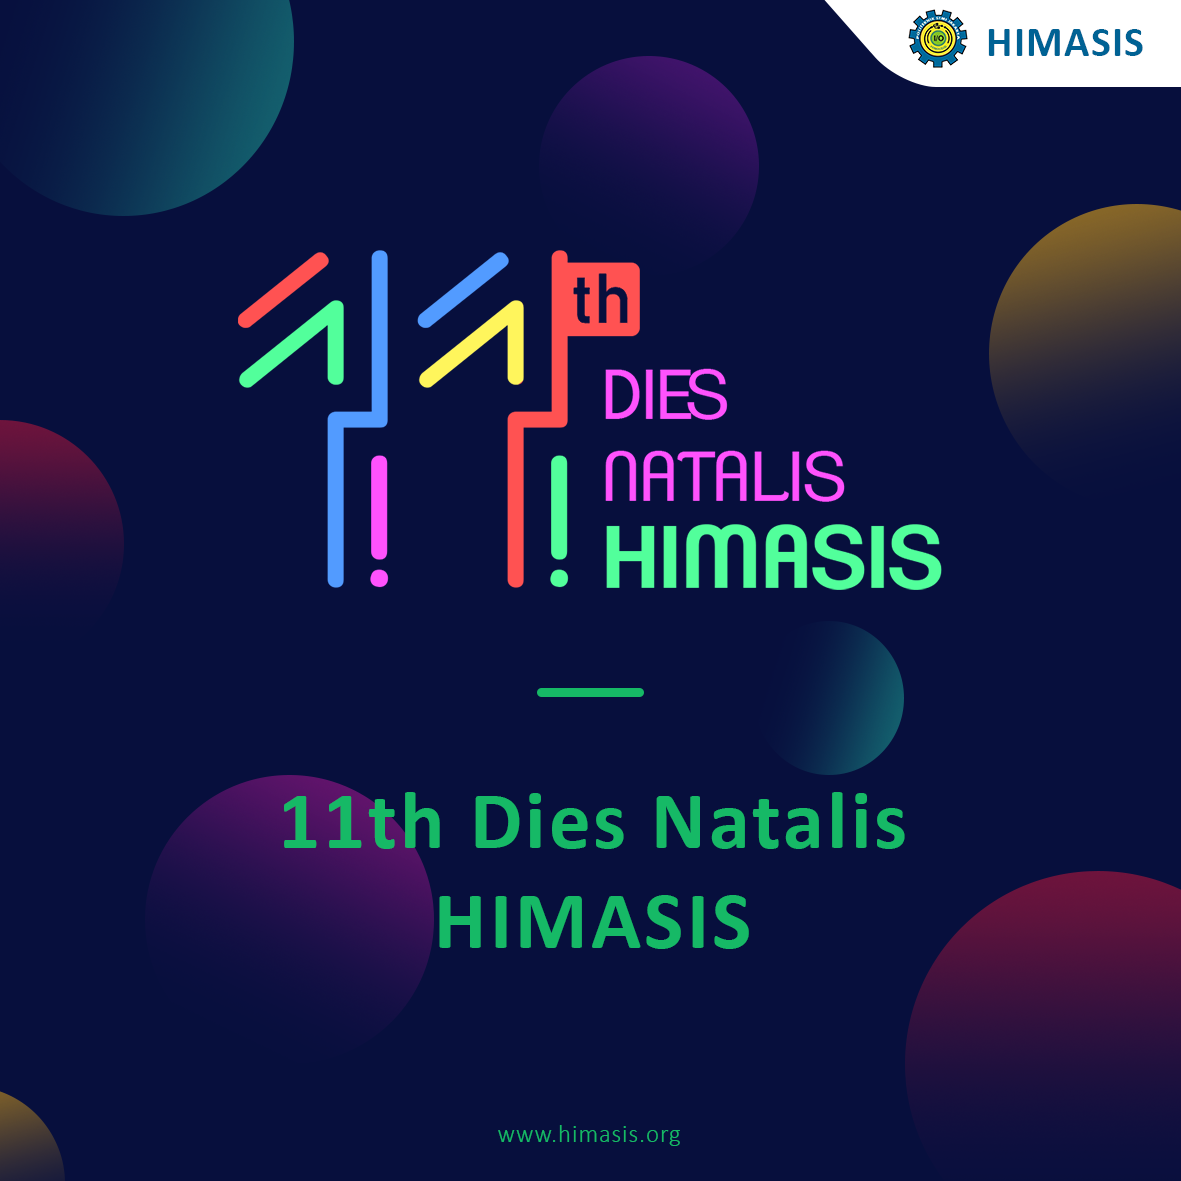 11th DIES NATALIES HIMASIS